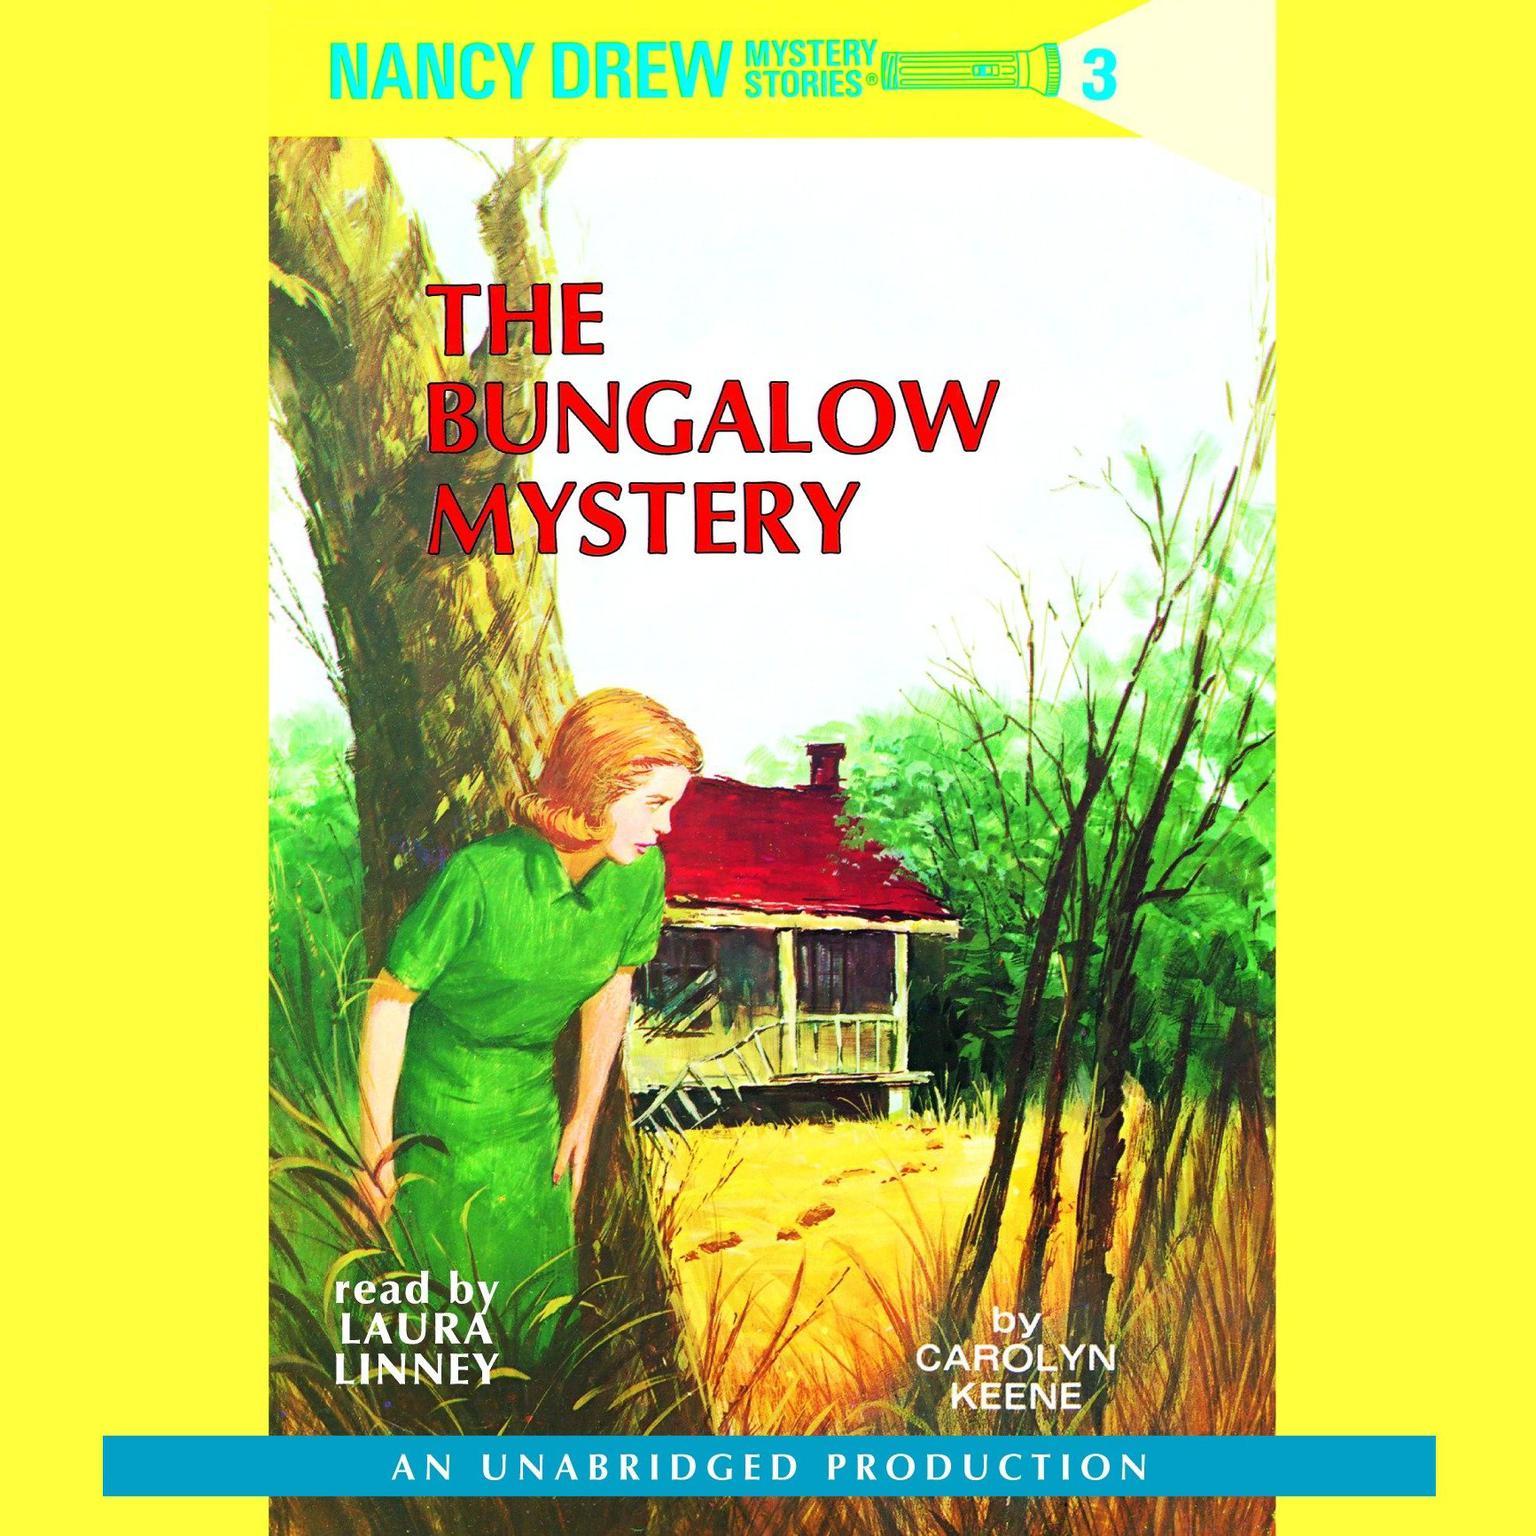 Nancy Drew #3: The Bungalow Mystery Audiobook, by Carolyn Keene